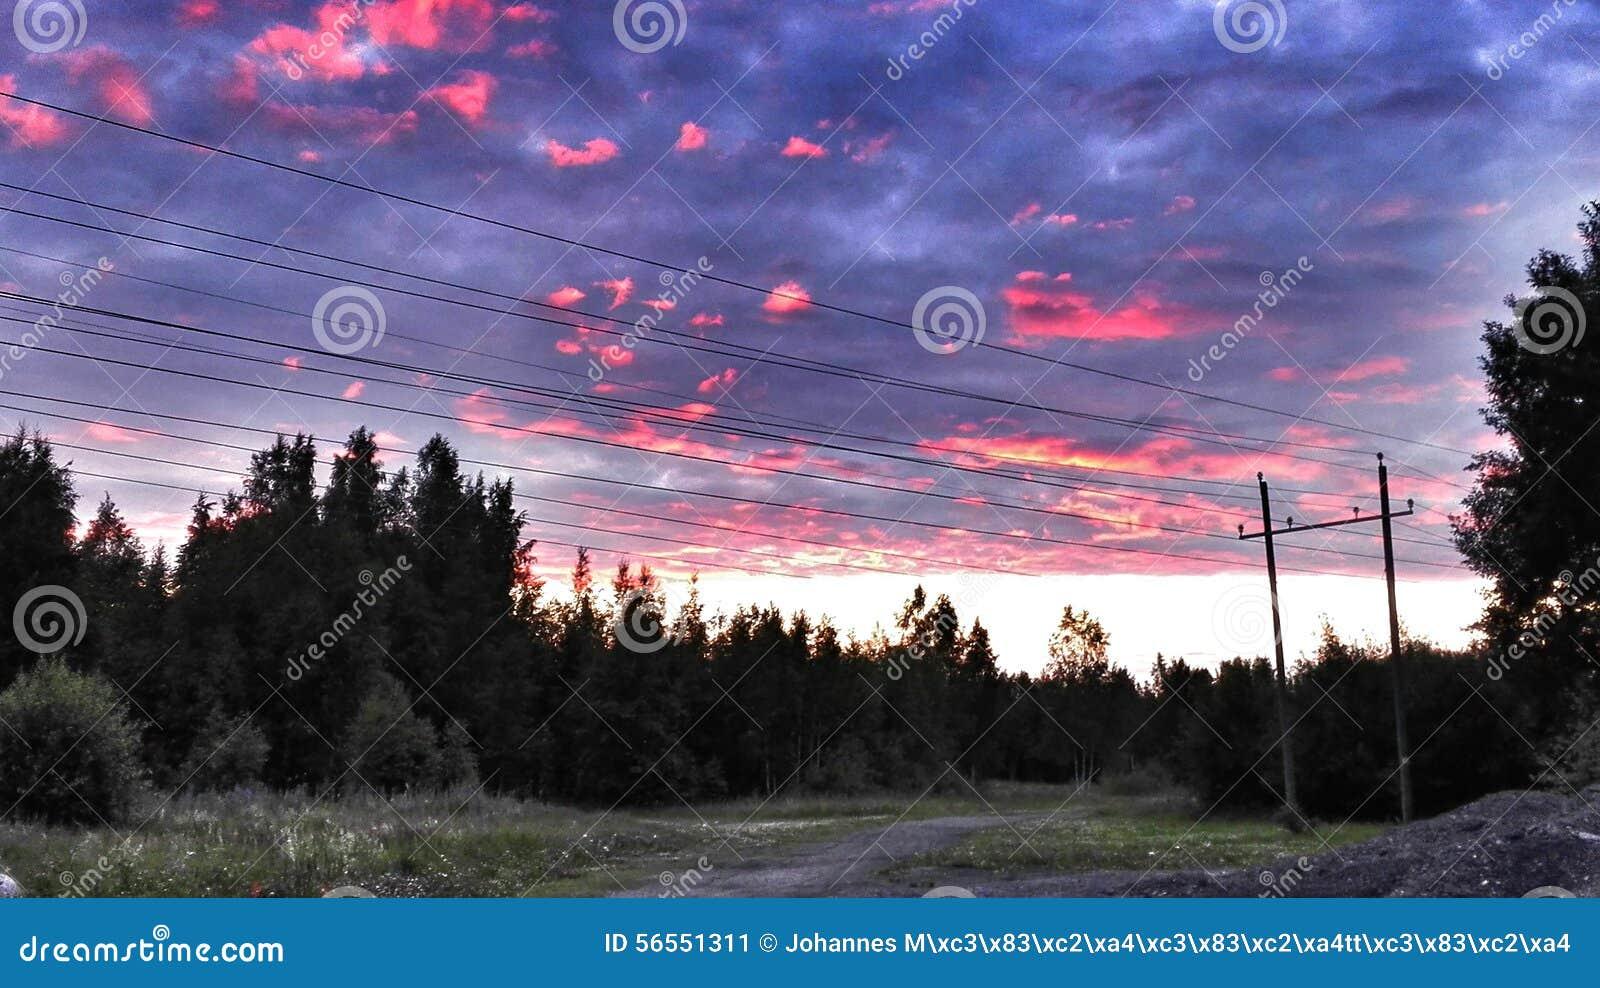 Download όμορφο ηλιοβασίλεμα στοκ εικόνα. εικόνα από ηλιοβασίλεμα - 56551311